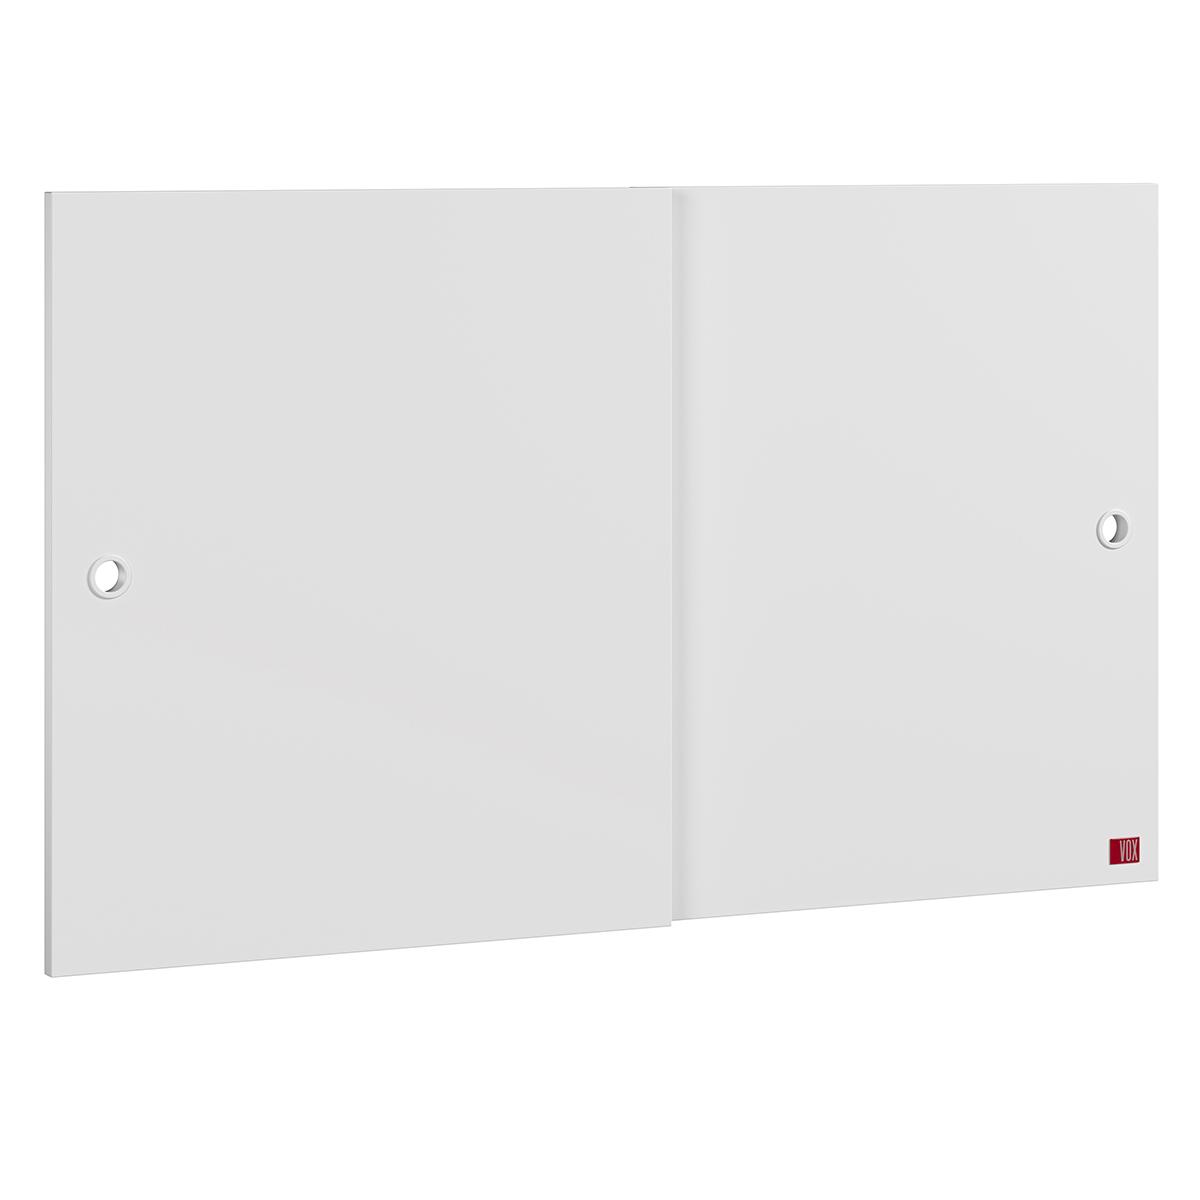 Commode Portes Additionnelles Commode Retro - Blanc Portes Additionnelles Commode Retro - Blanc